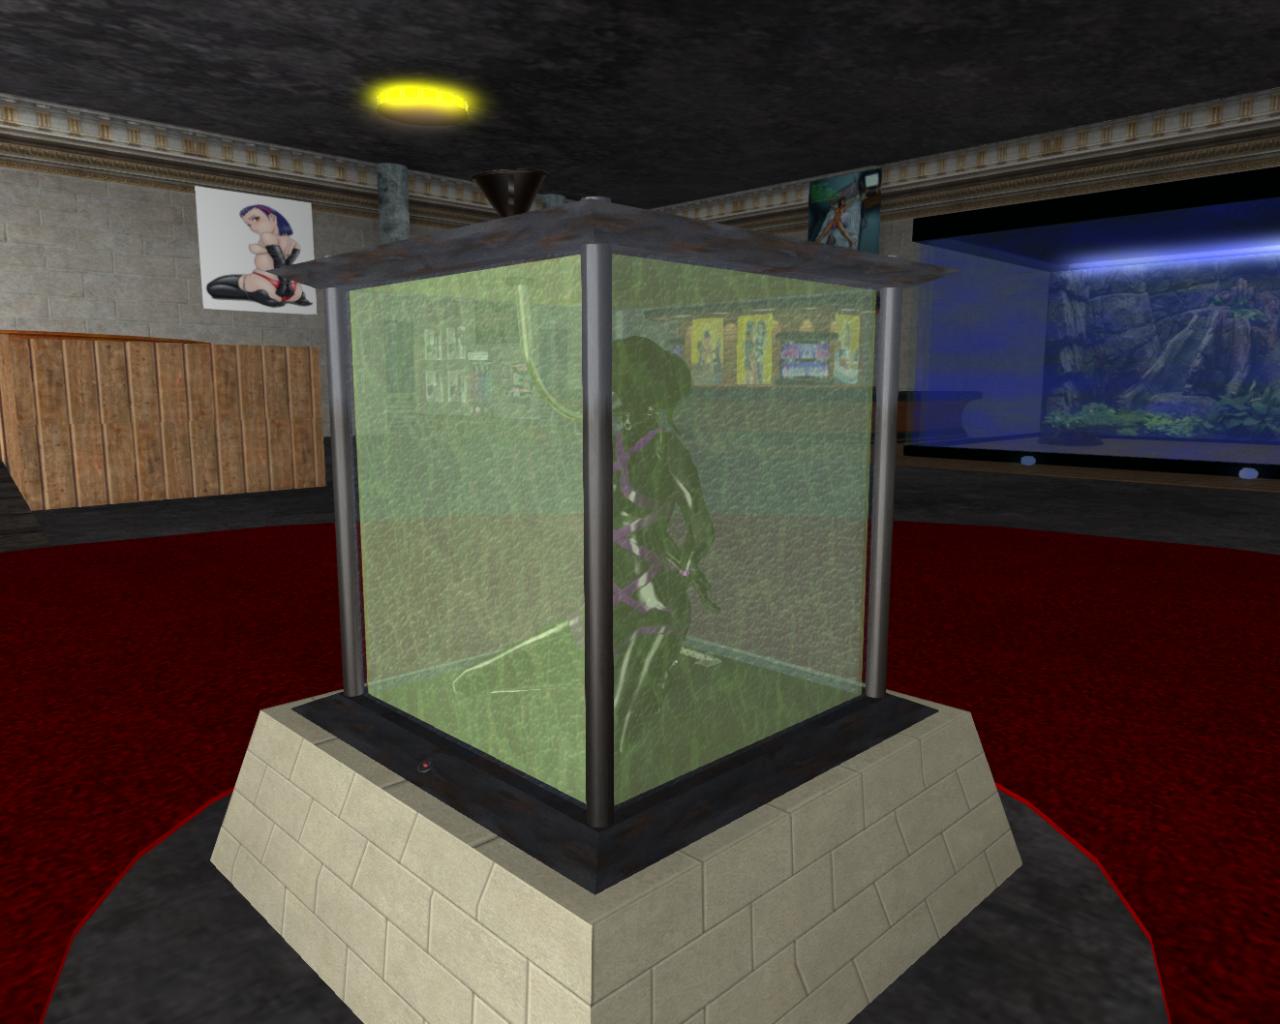 Virtual Bdsm Ames Bdsm Toys - Resin Box-9449